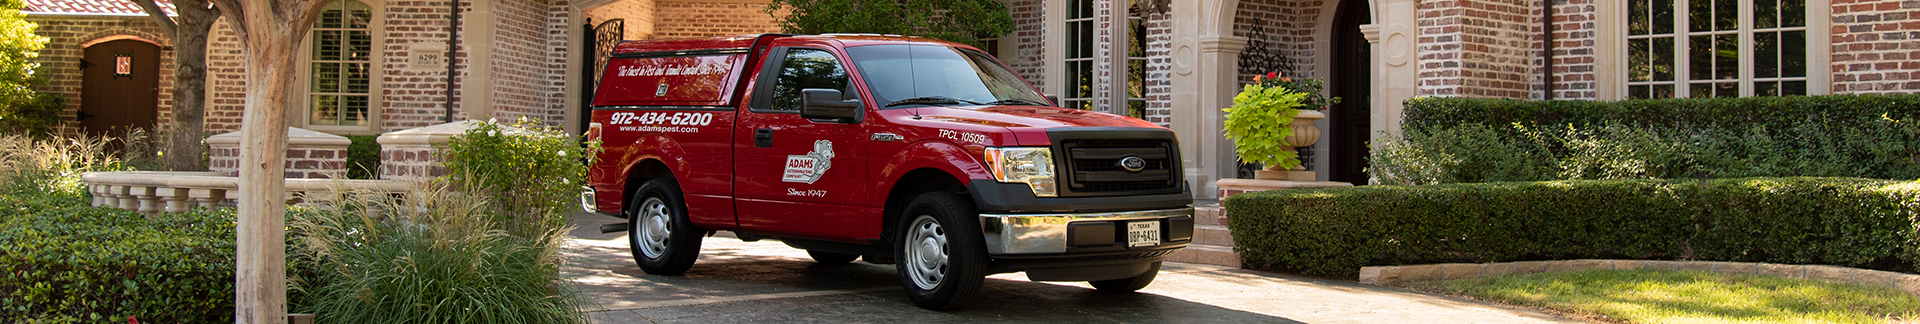 adams pest control's truck in prosper texas